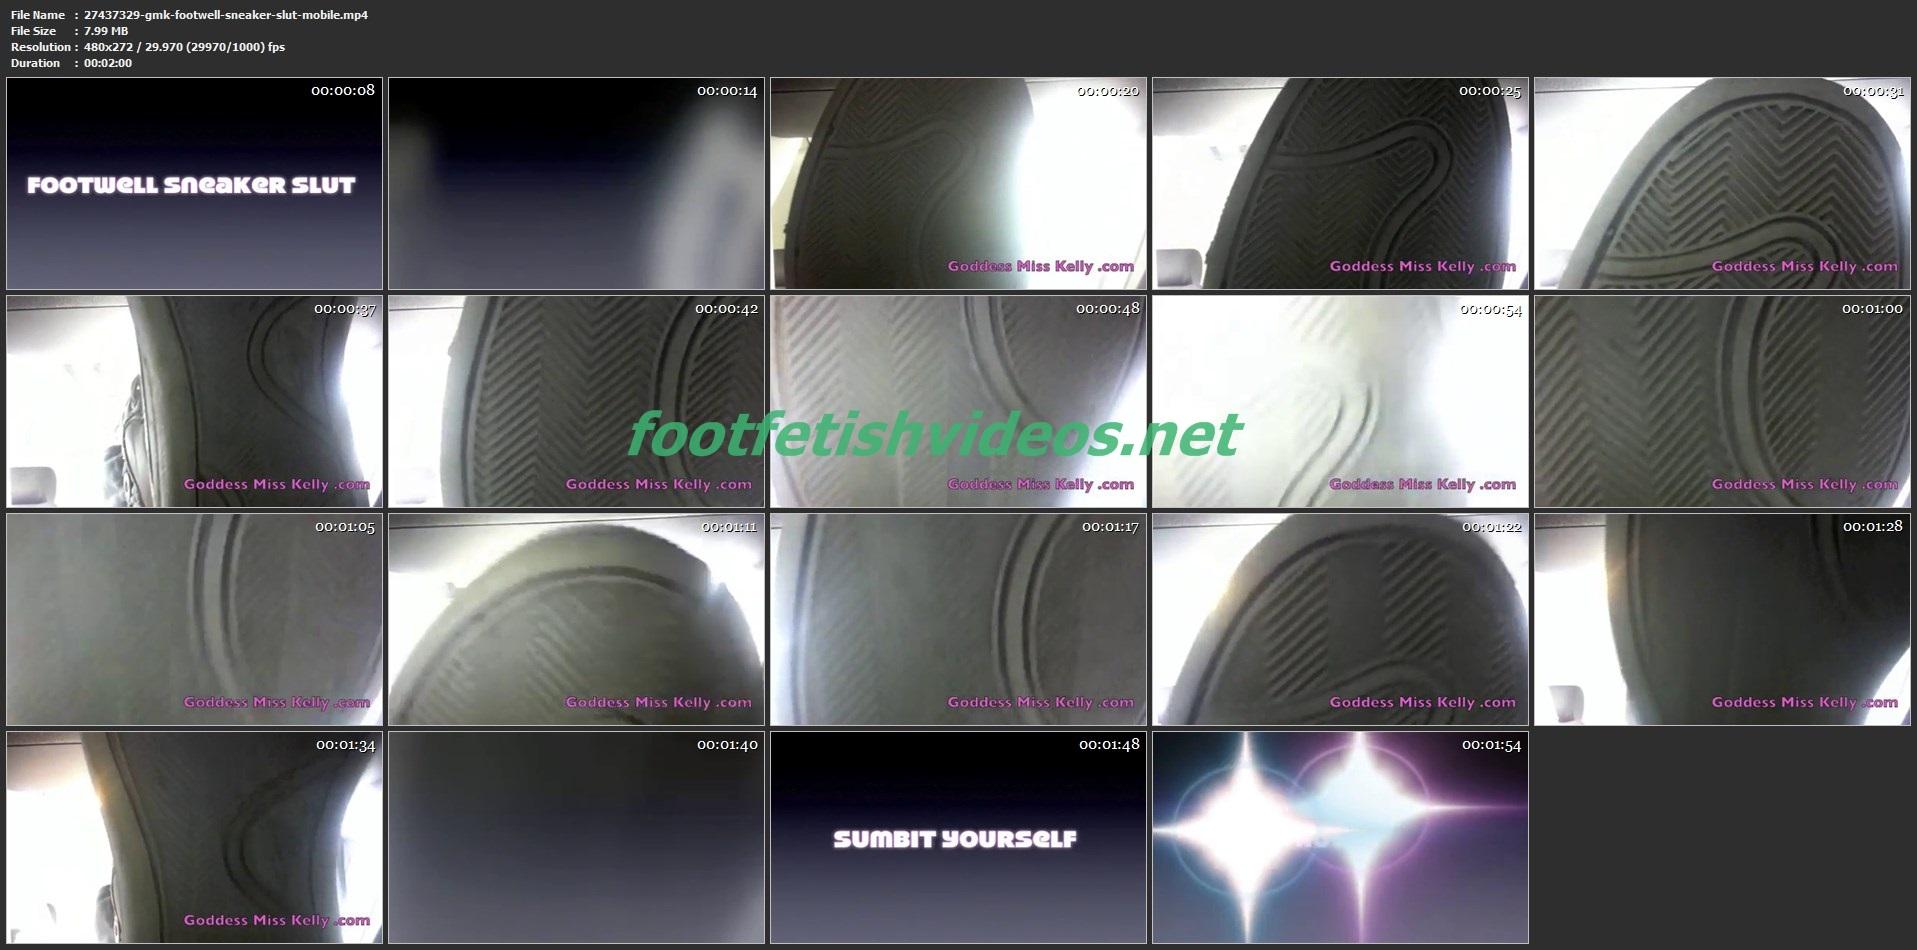 goddessmskelly-27437329-gmk-footwell-sneaker-slut-mobile-mp4